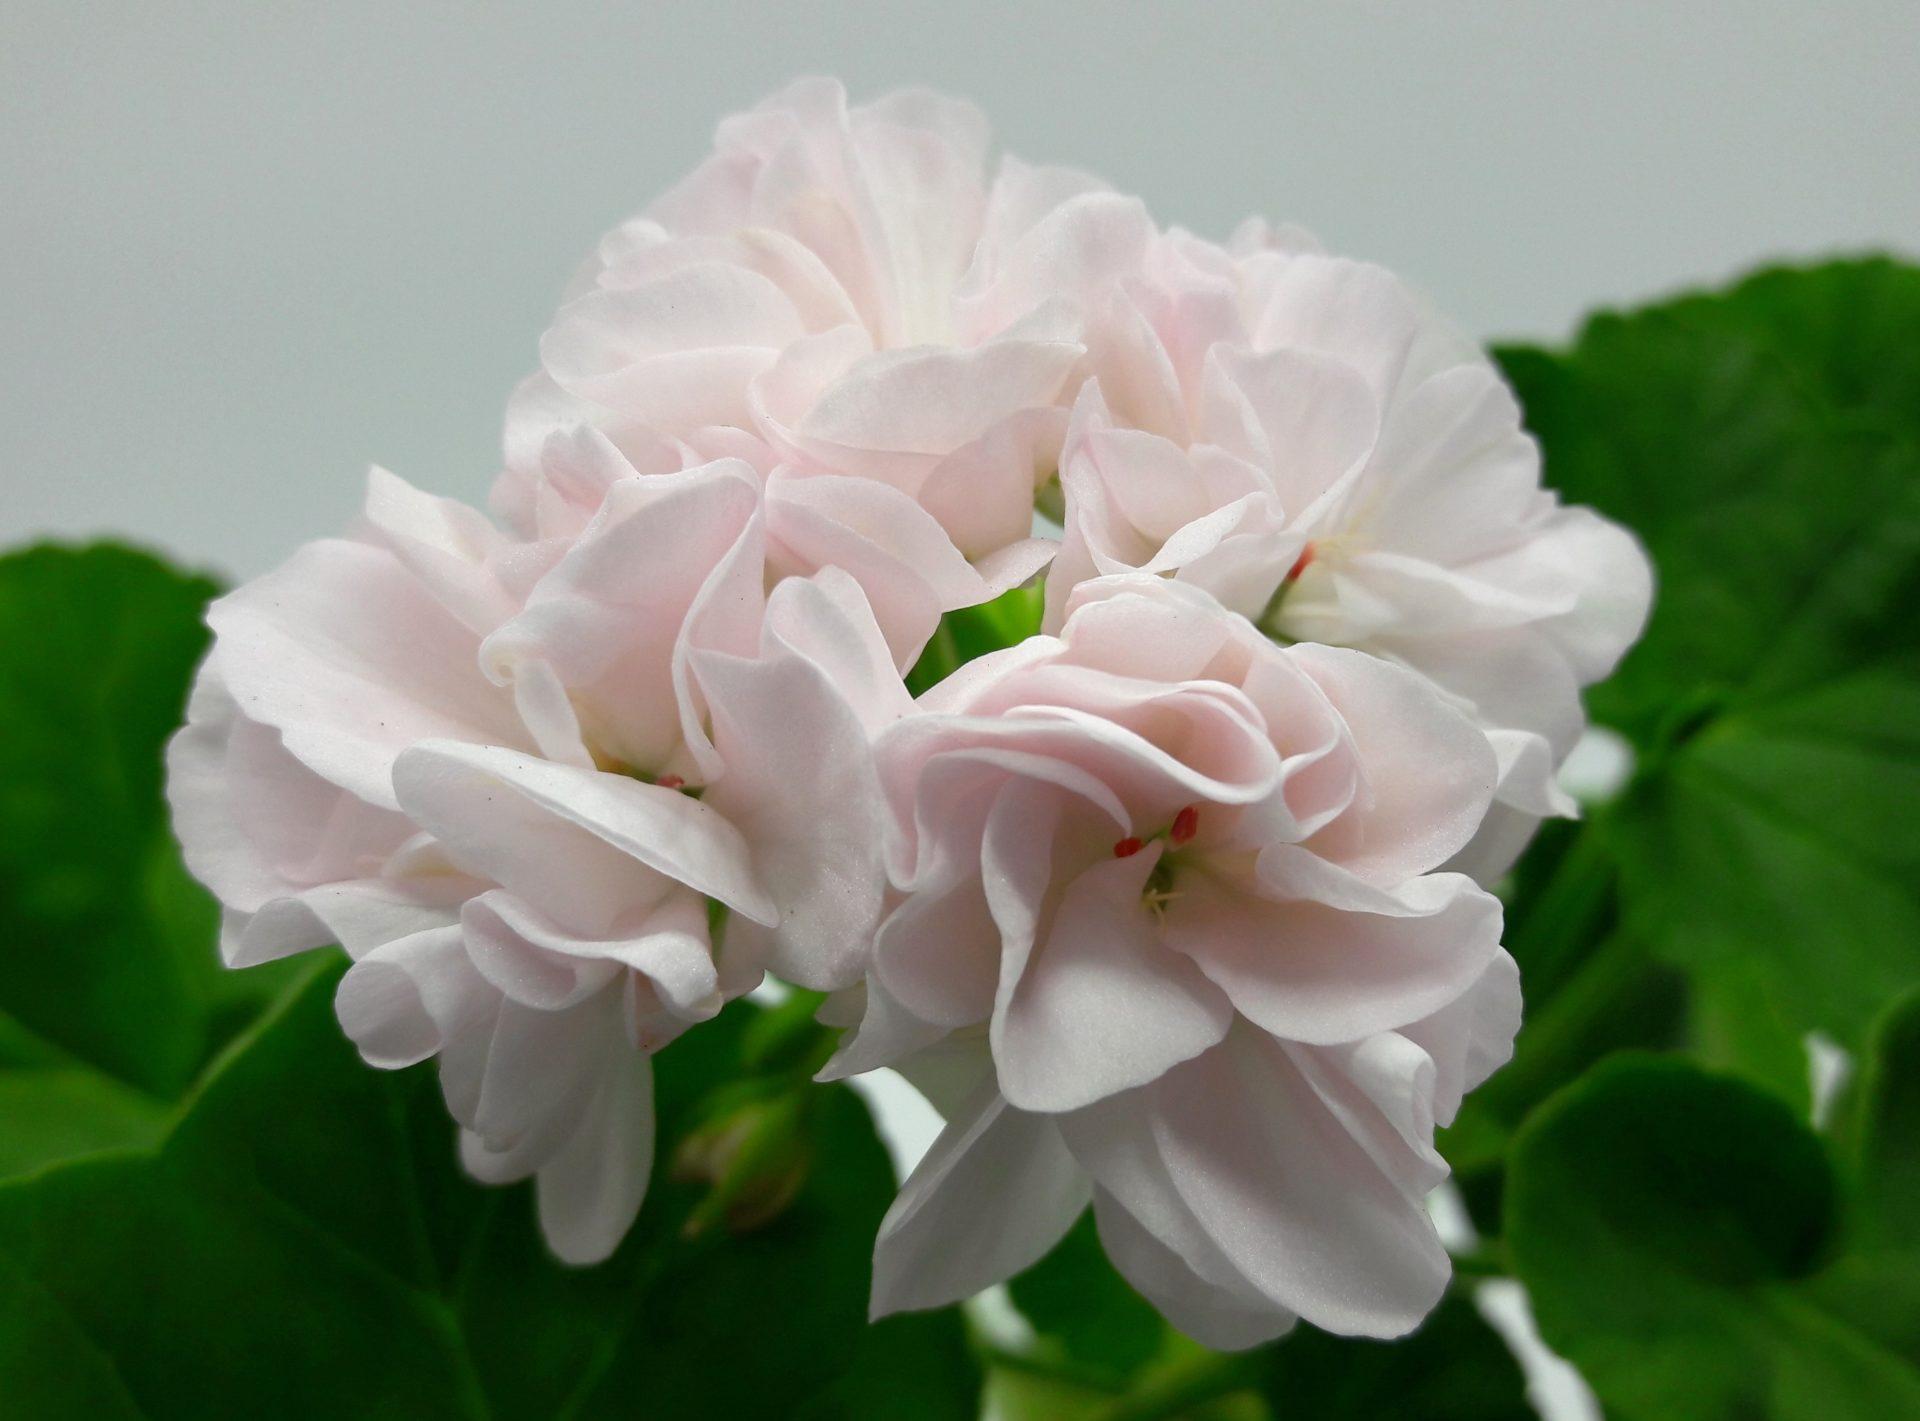 Silk swan pelargonium photo